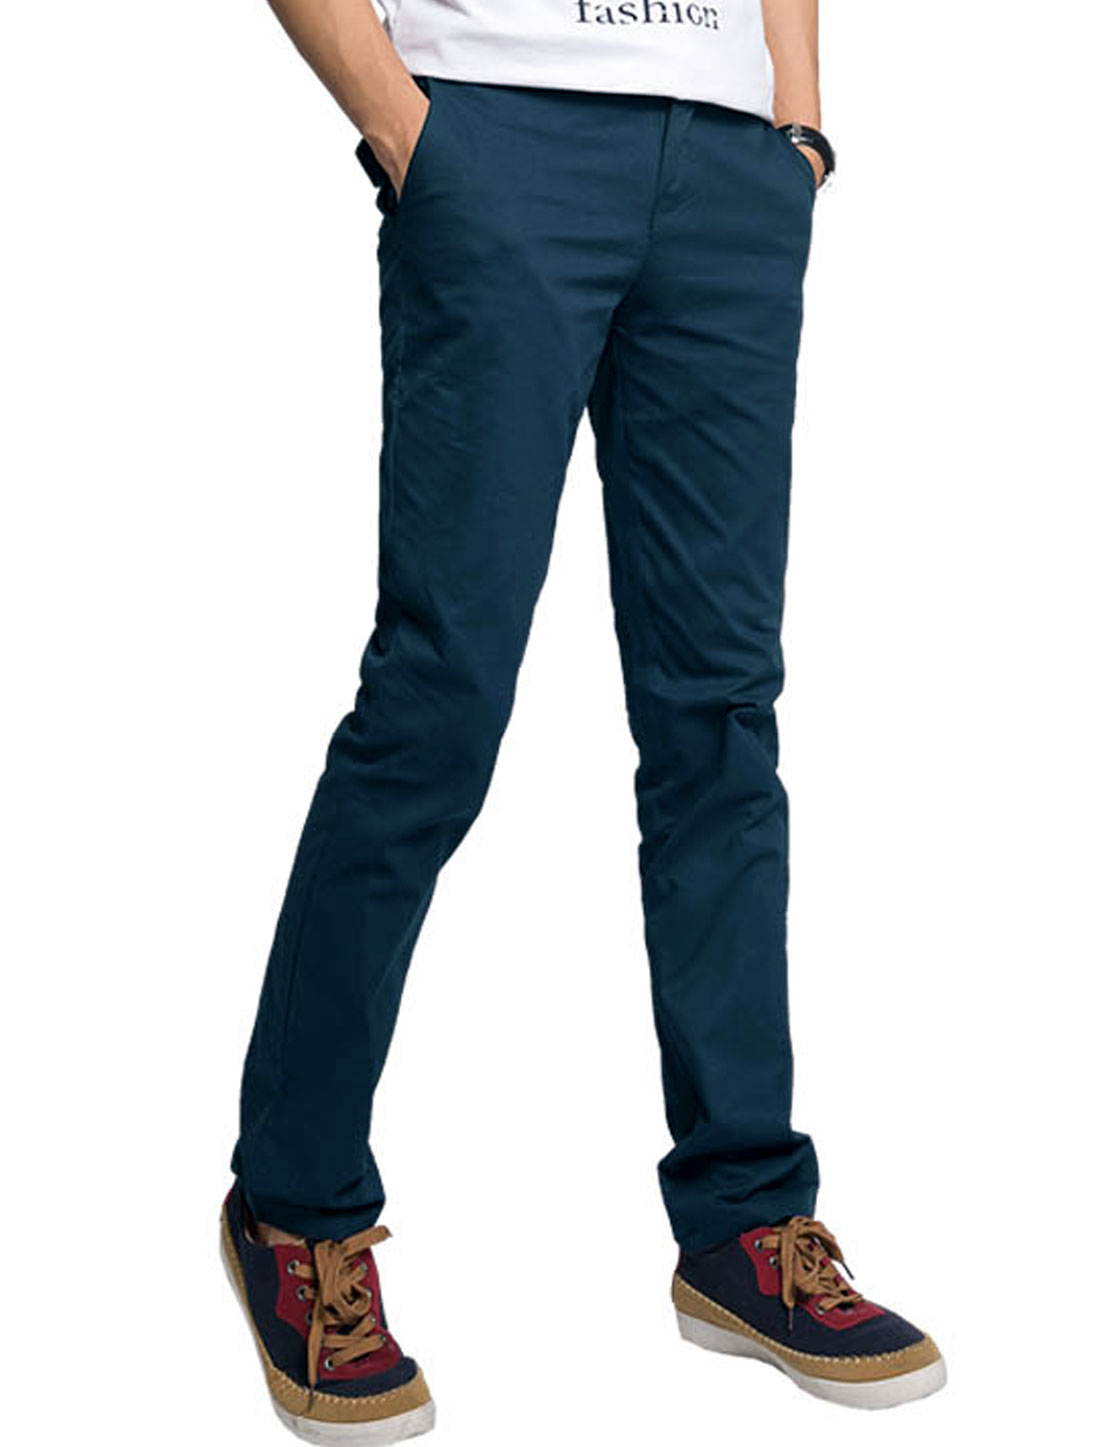 Men Zip Up Closure Back Pocket Decor Leisure Slim Pants Navy Blue W40